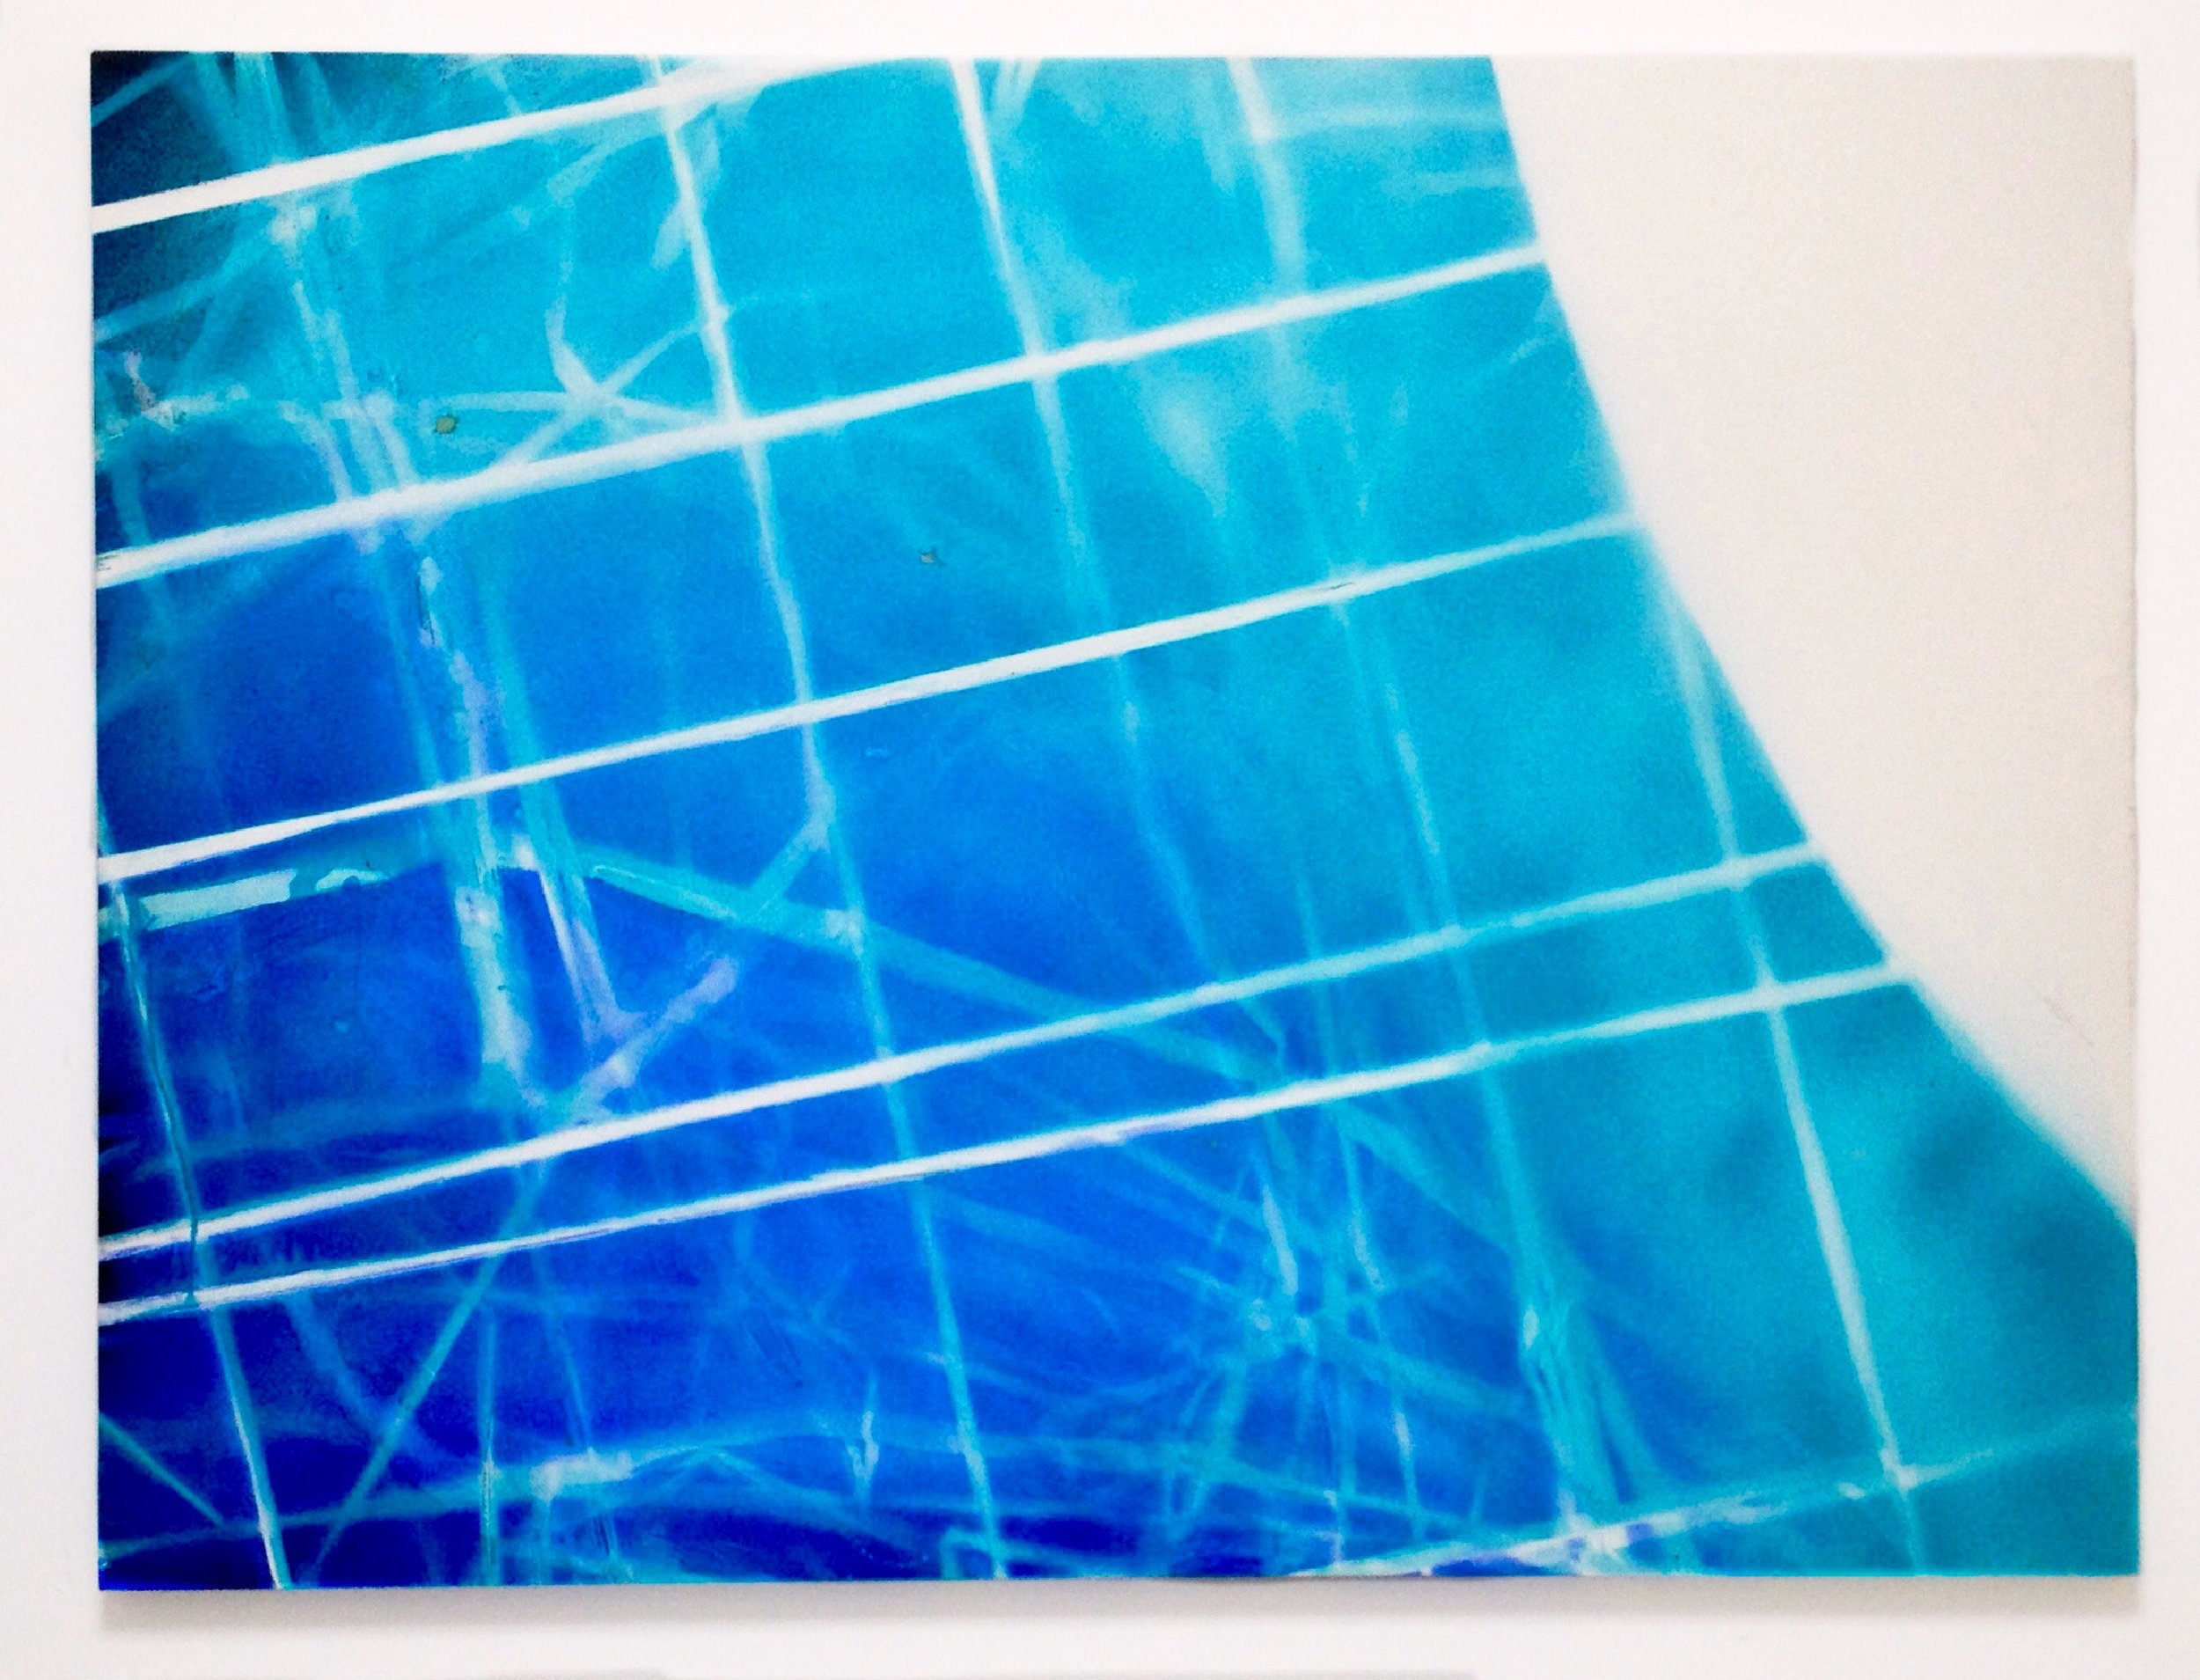 IAIN MUIRHEAD   1513  , 2015. Airborne pigment, acrylic binder, 10oz cotton duck canvas, white titanium gesso, milled pine, 3mm staples, 16 gauge pneumatic nails. 50 x 70 inches.